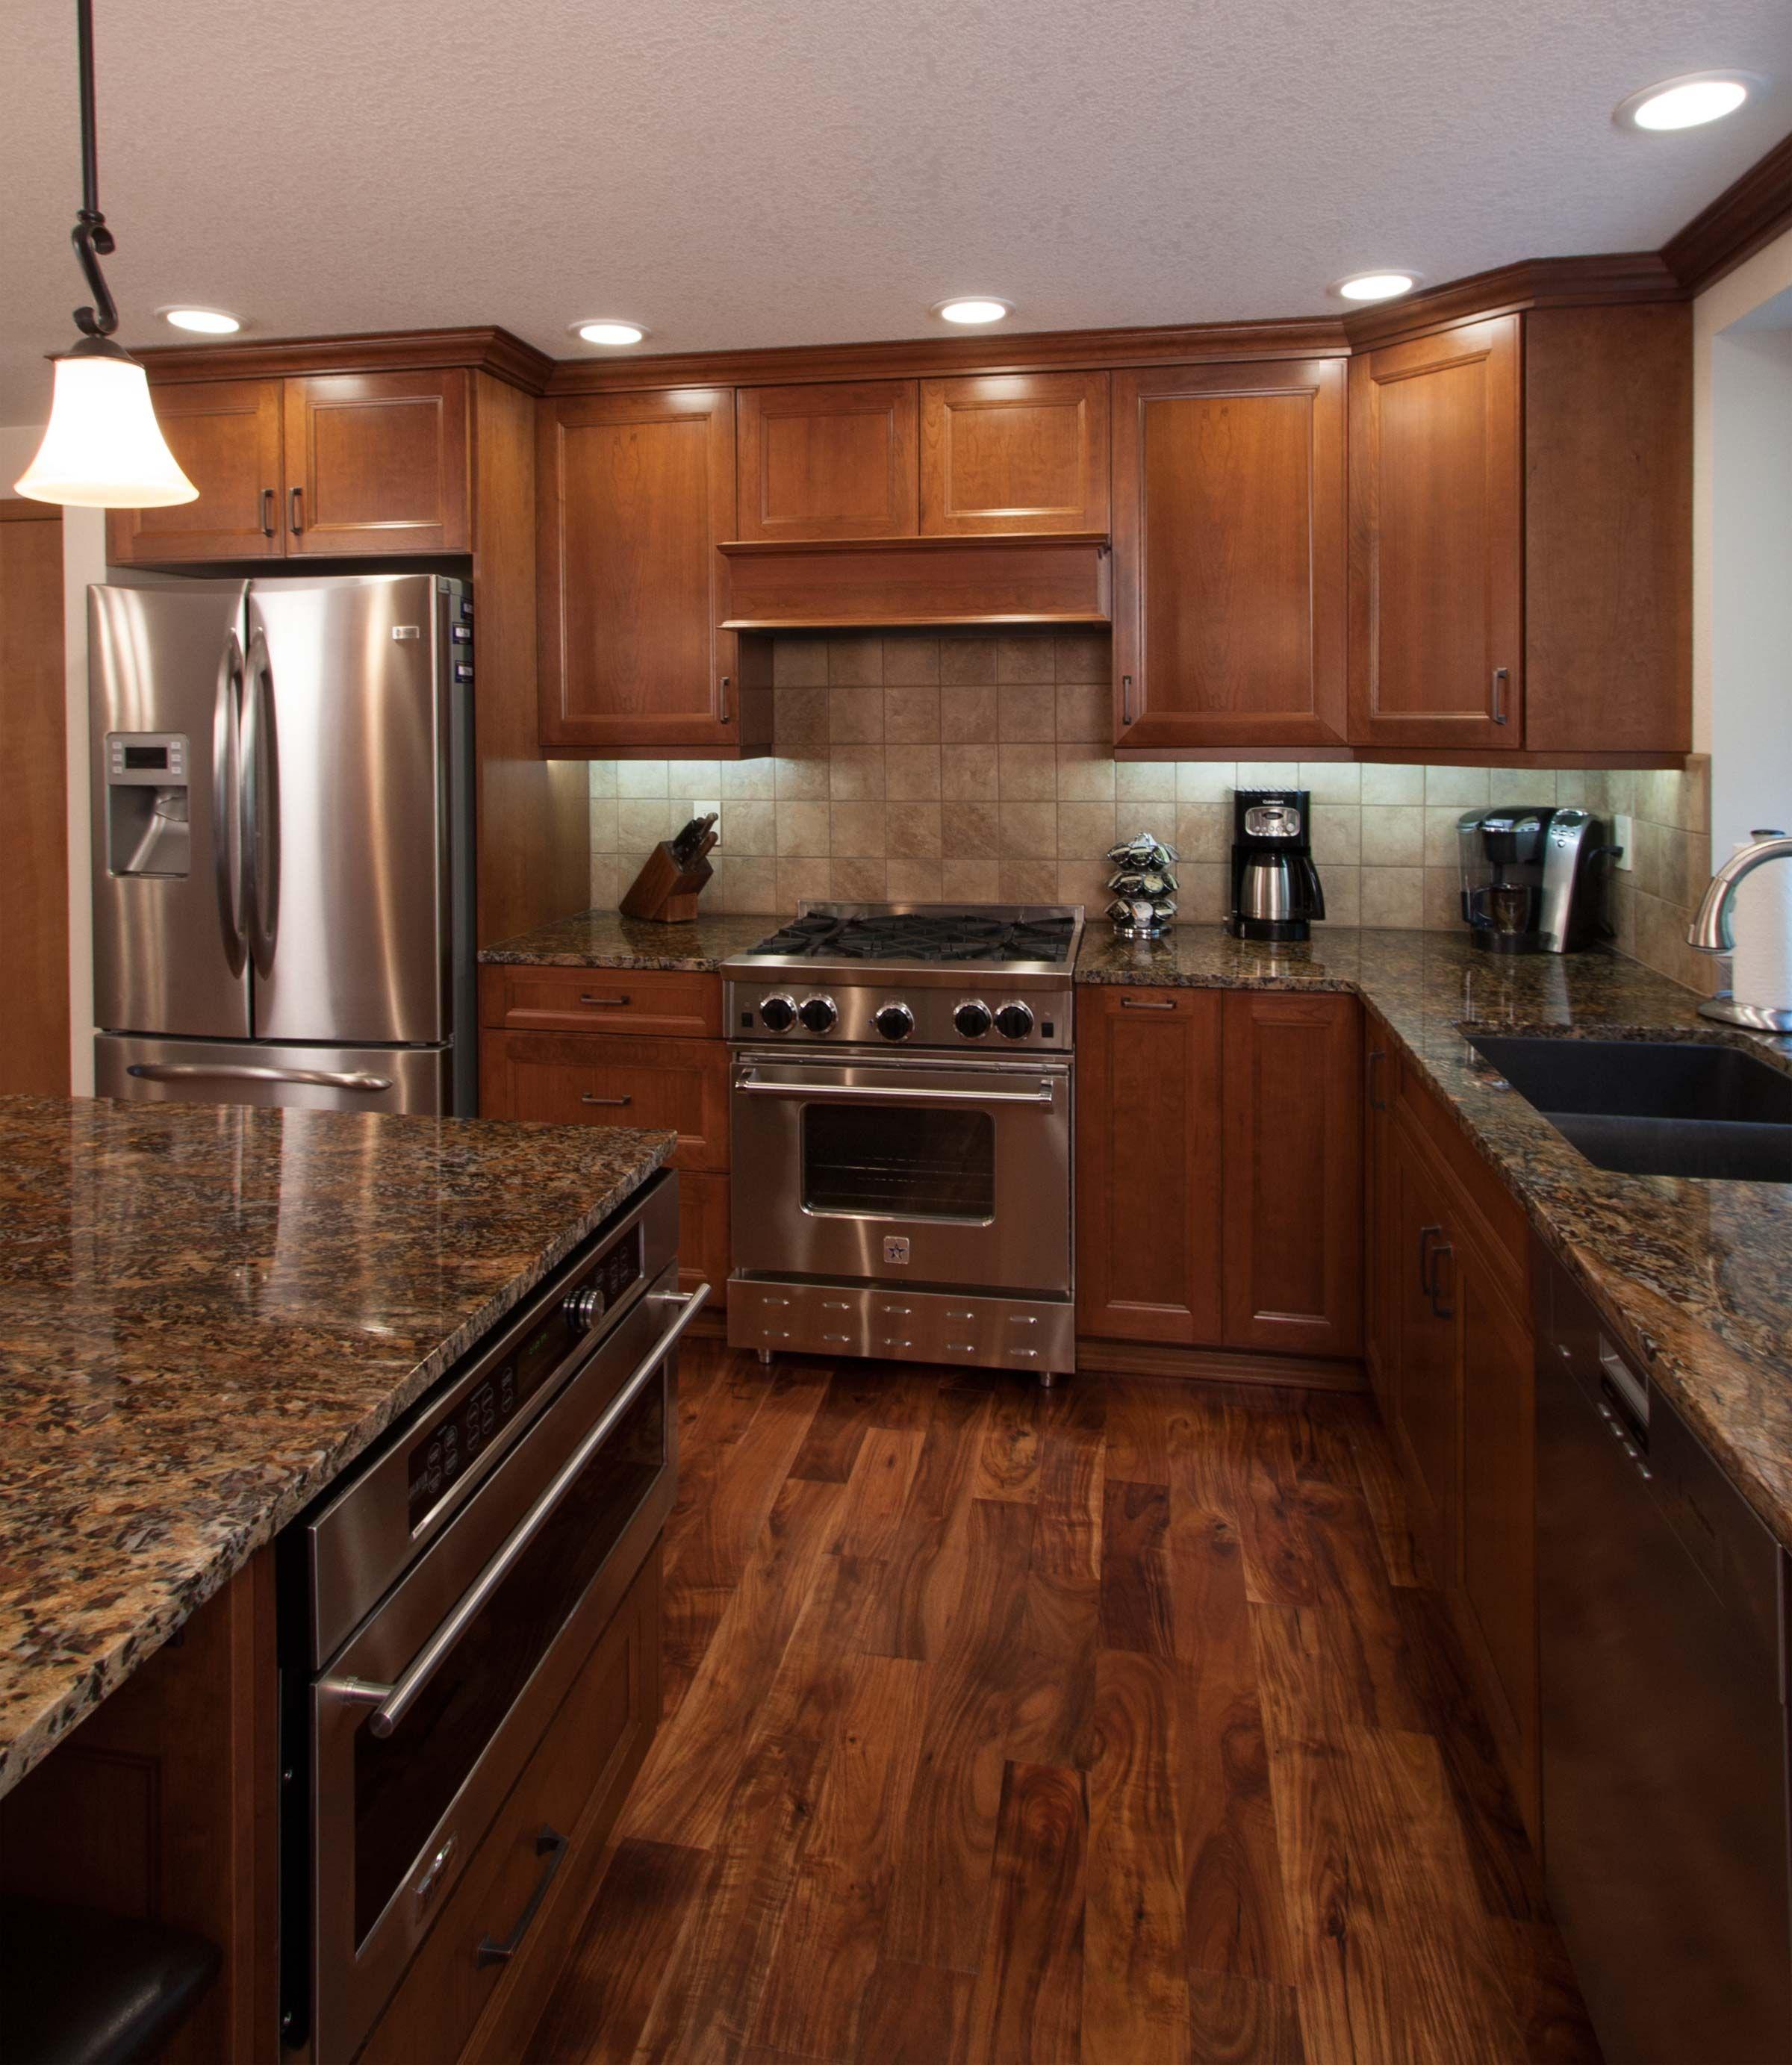 kitchen floor ideas with wood cabinets appealing wood floors in kitchen with cabi kitchen on kitchen flooring ideas id=63804